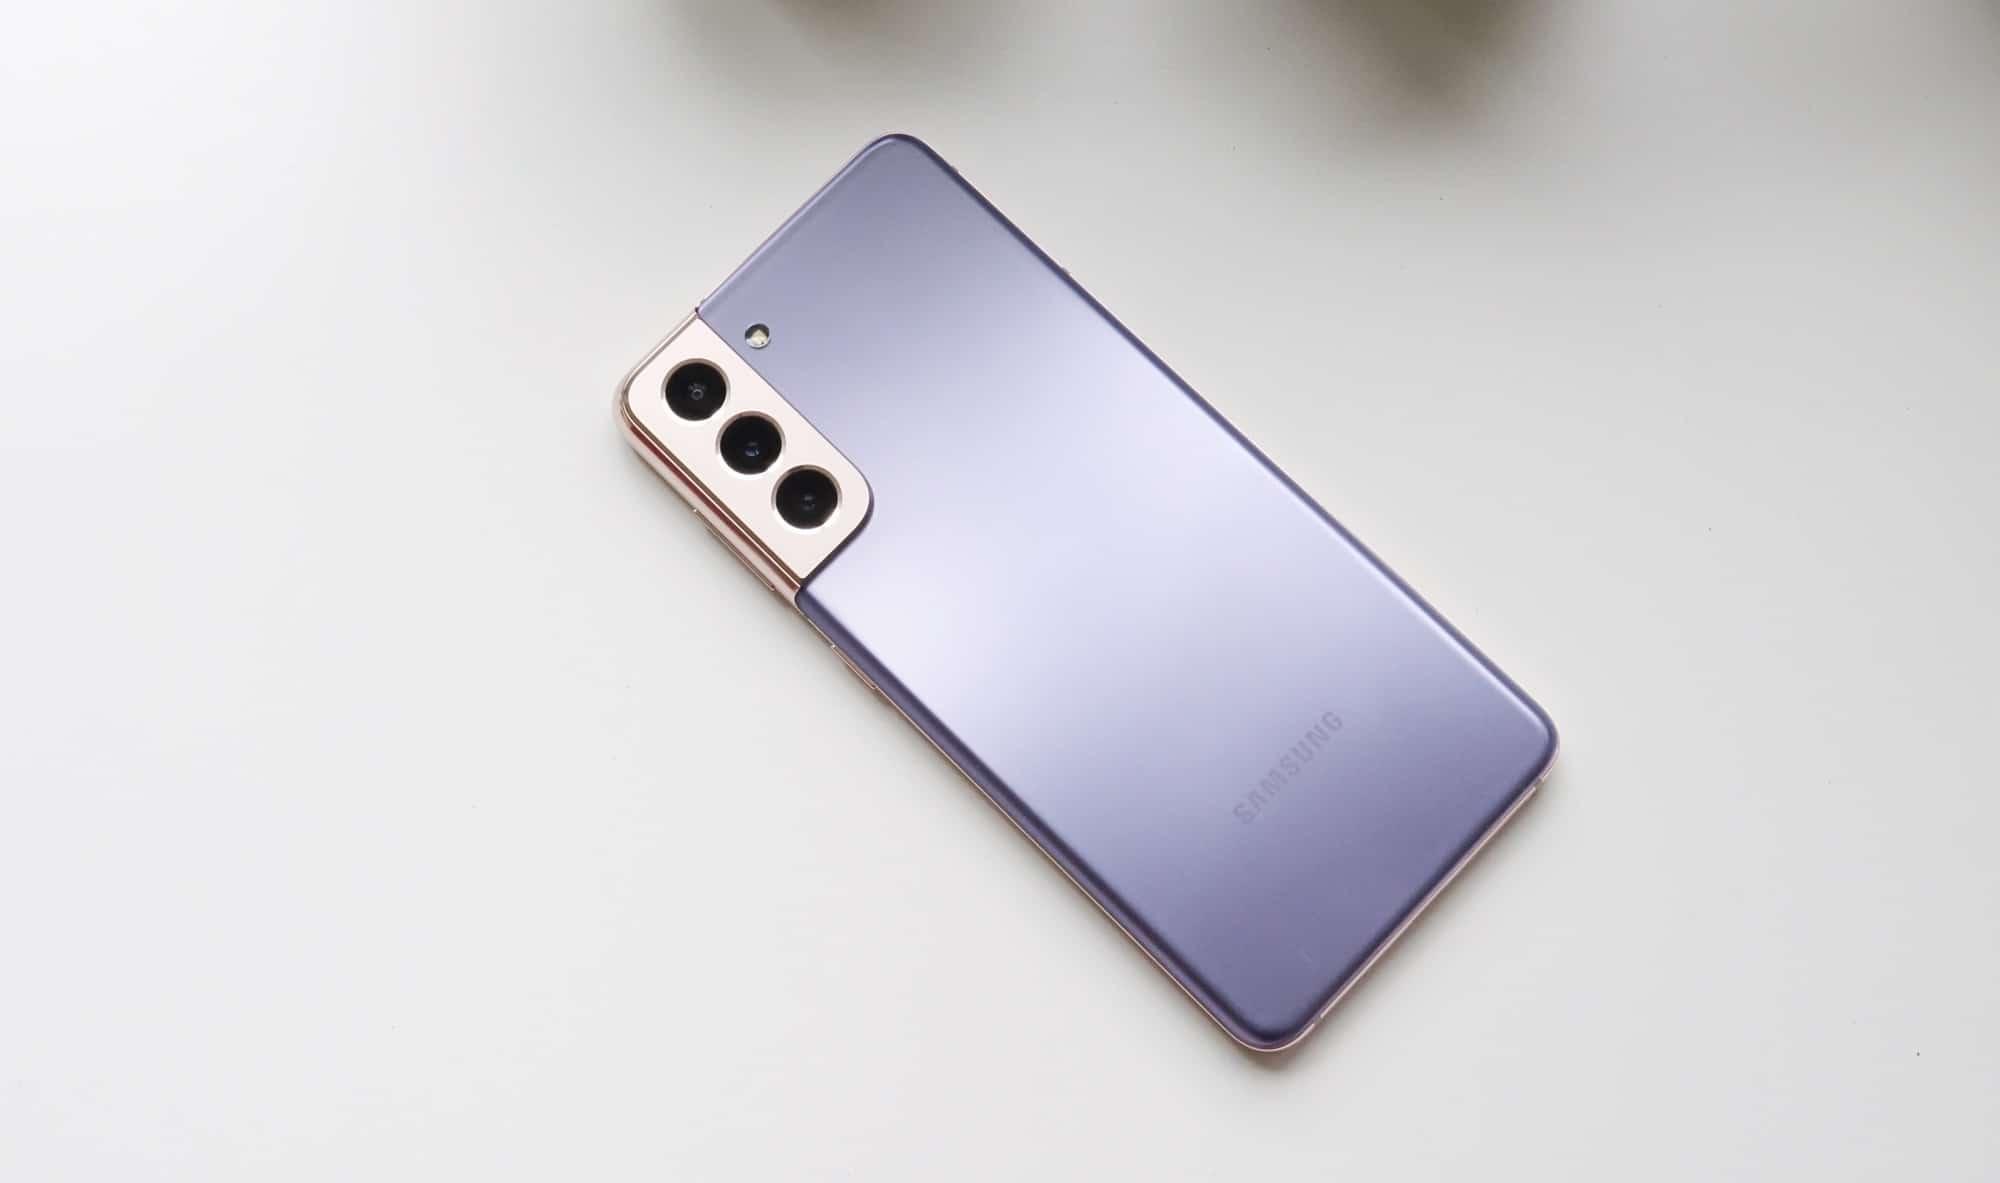 Samsung Galaxy S21 reviewed